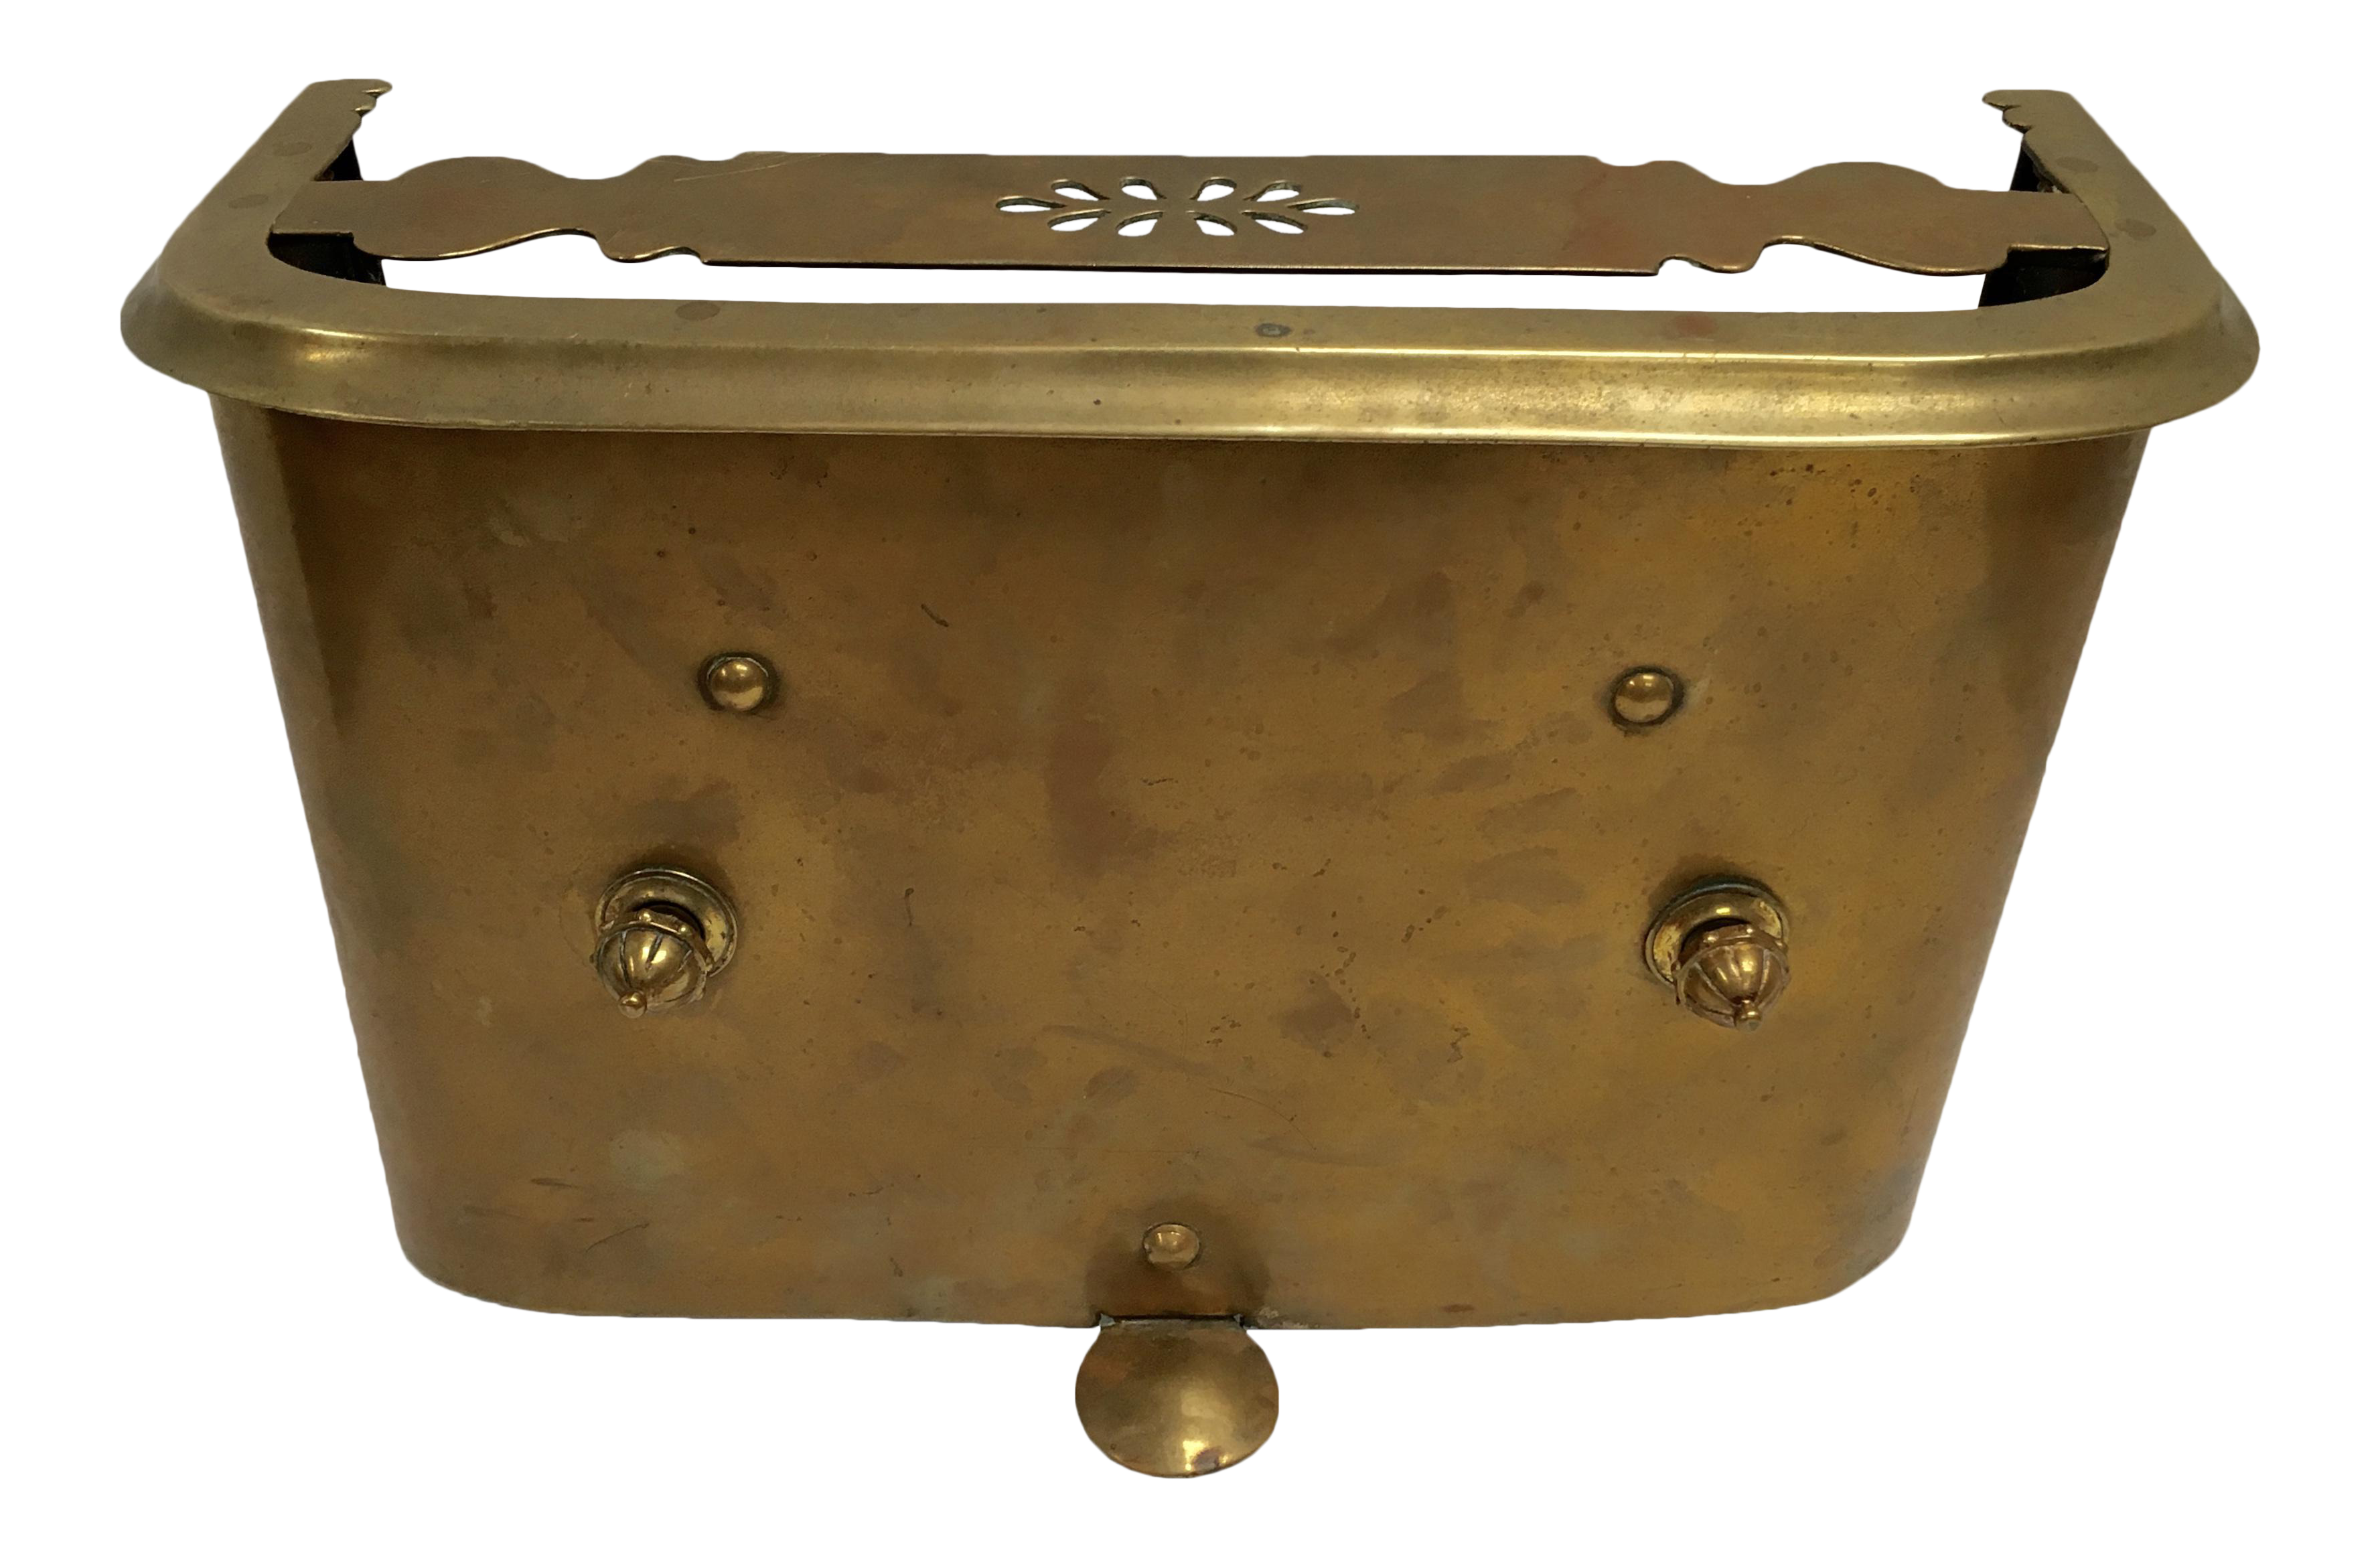 Magnificent Antique 1800S Brass Fireplace Fender 4 Good On Chairish In Download Free Architecture Designs Scobabritishbridgeorg